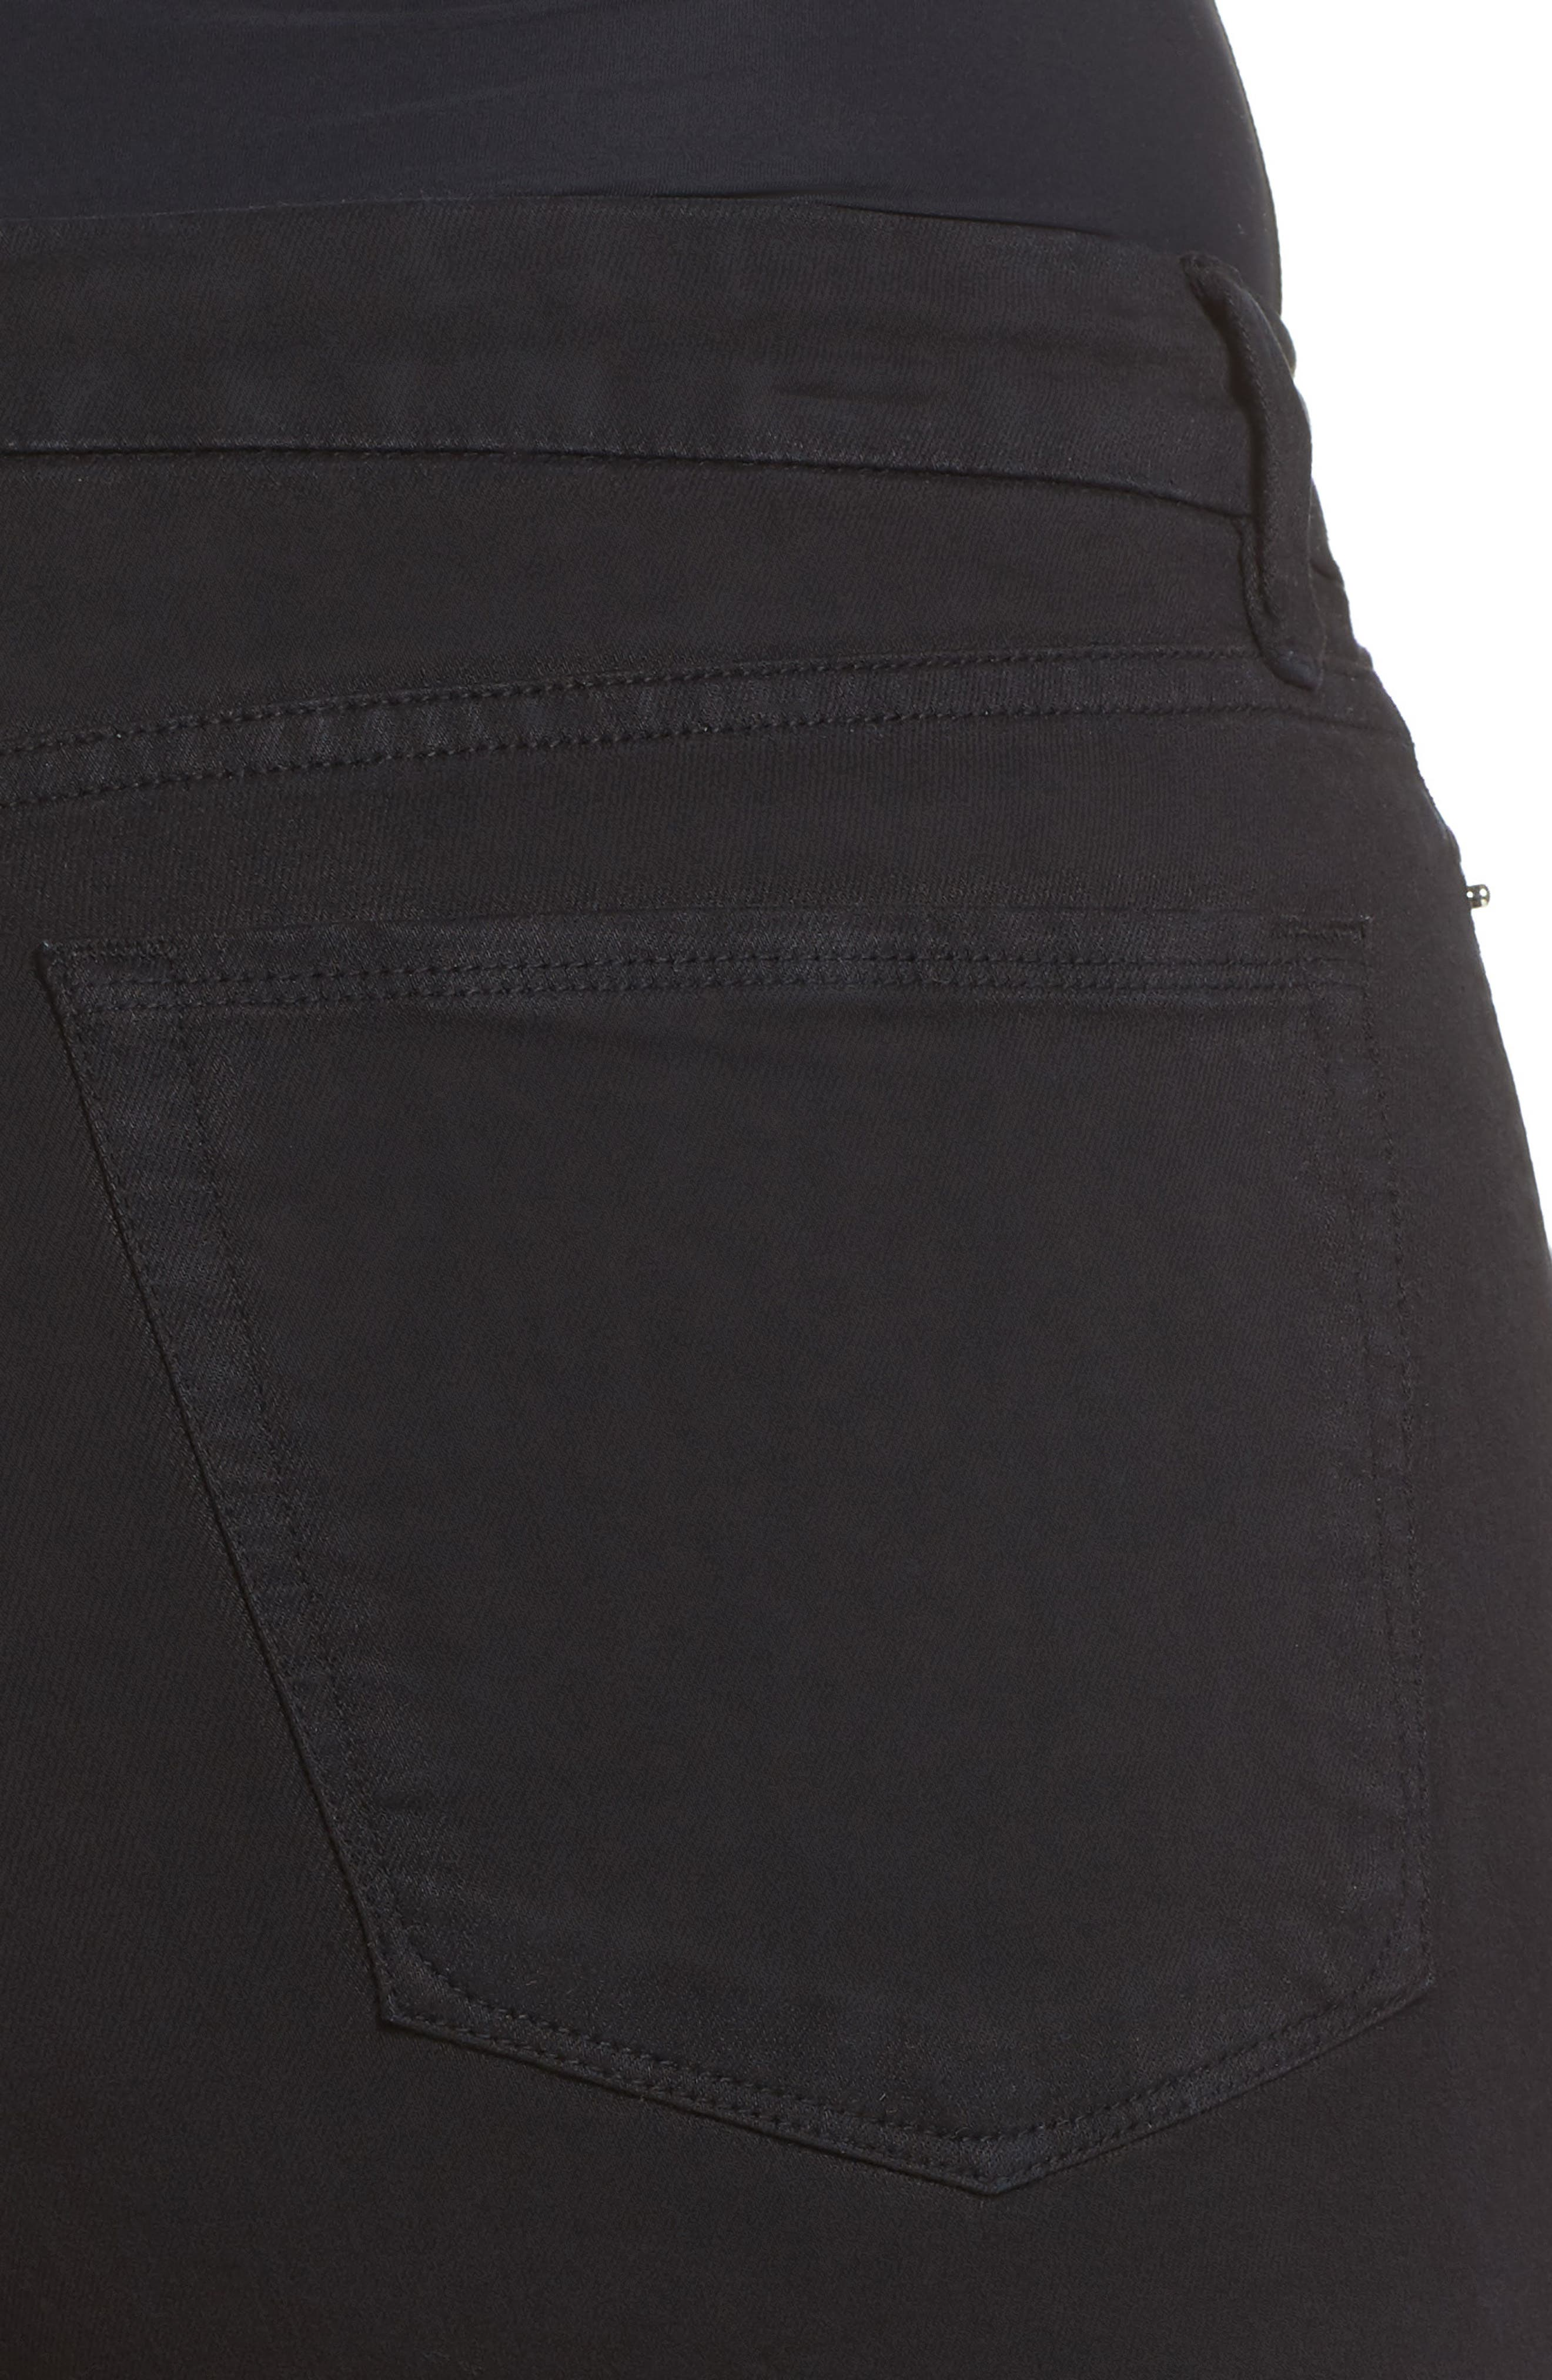 Destroyed Cutoff Denim Shorts,                             Alternate thumbnail 4, color,                             001